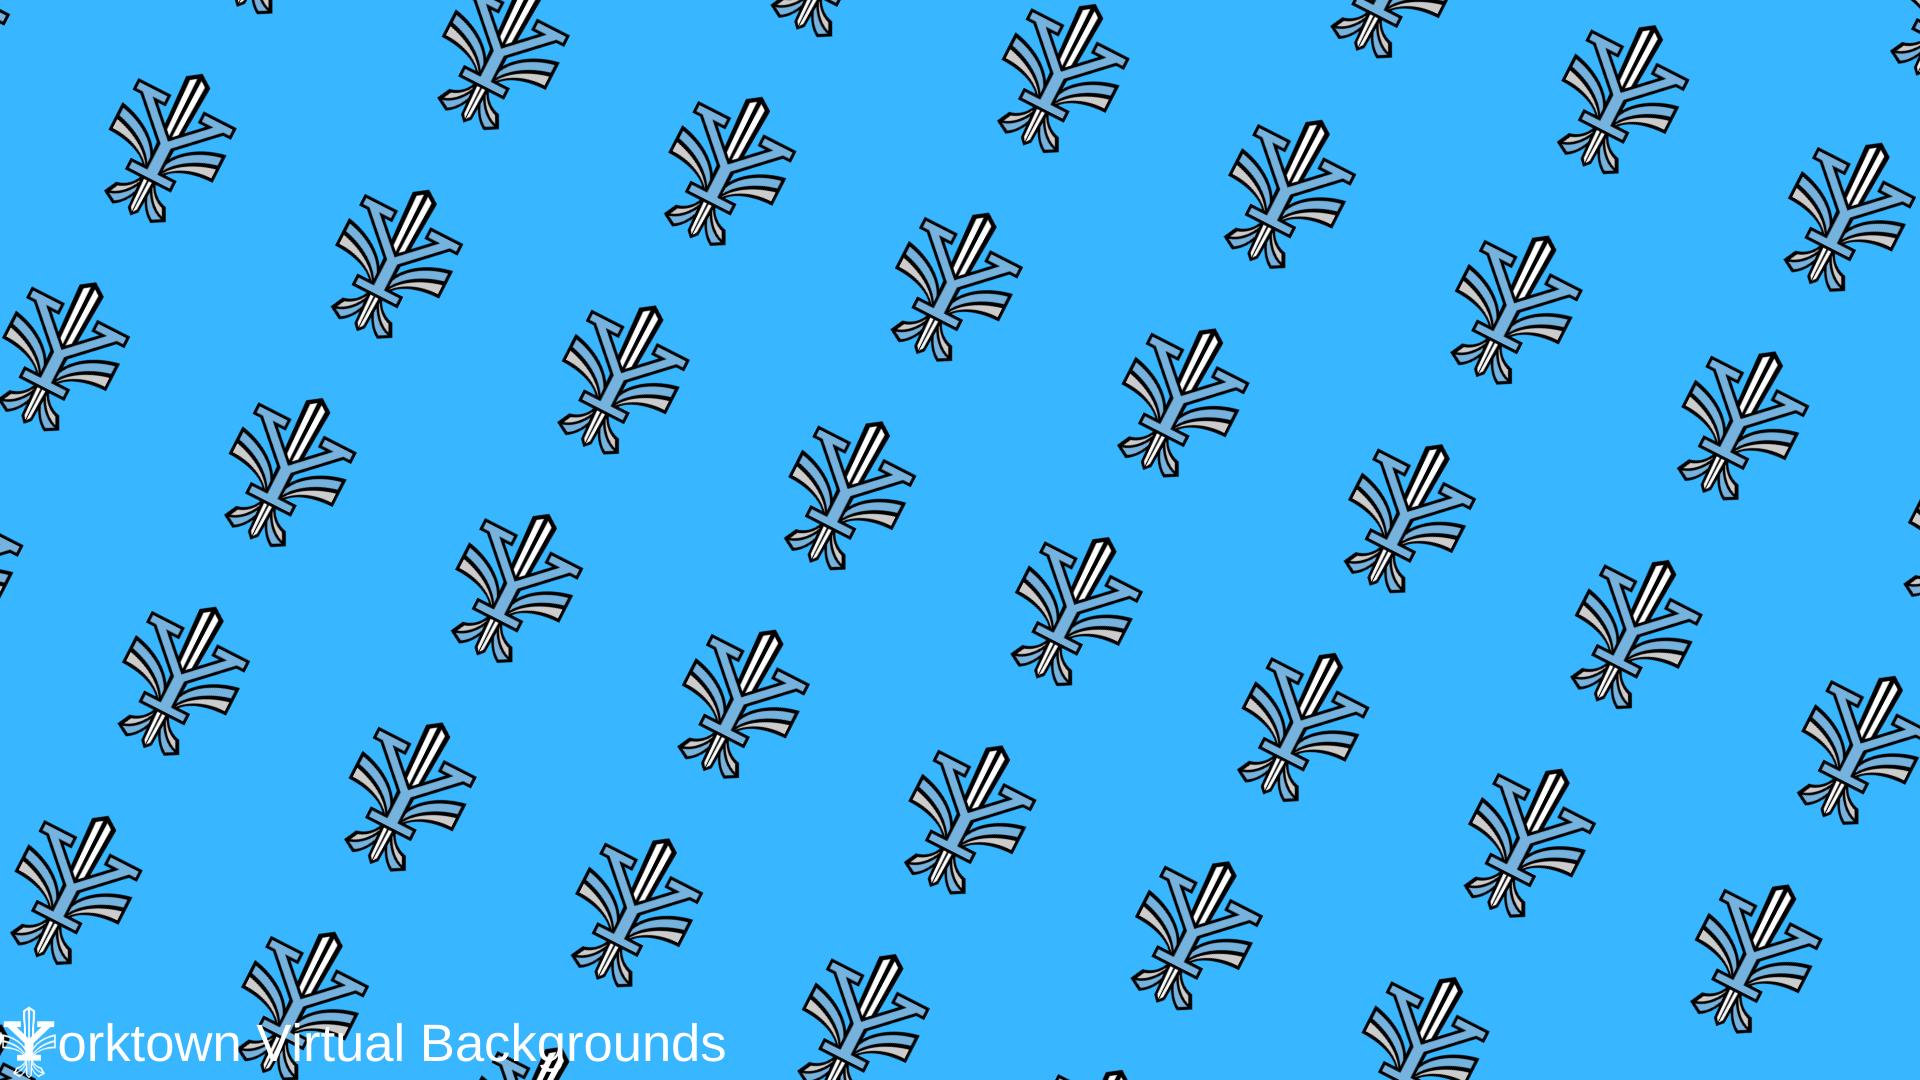 Yorktown Logo Wallpaper for Teams - Patriot Blue - Diagonal